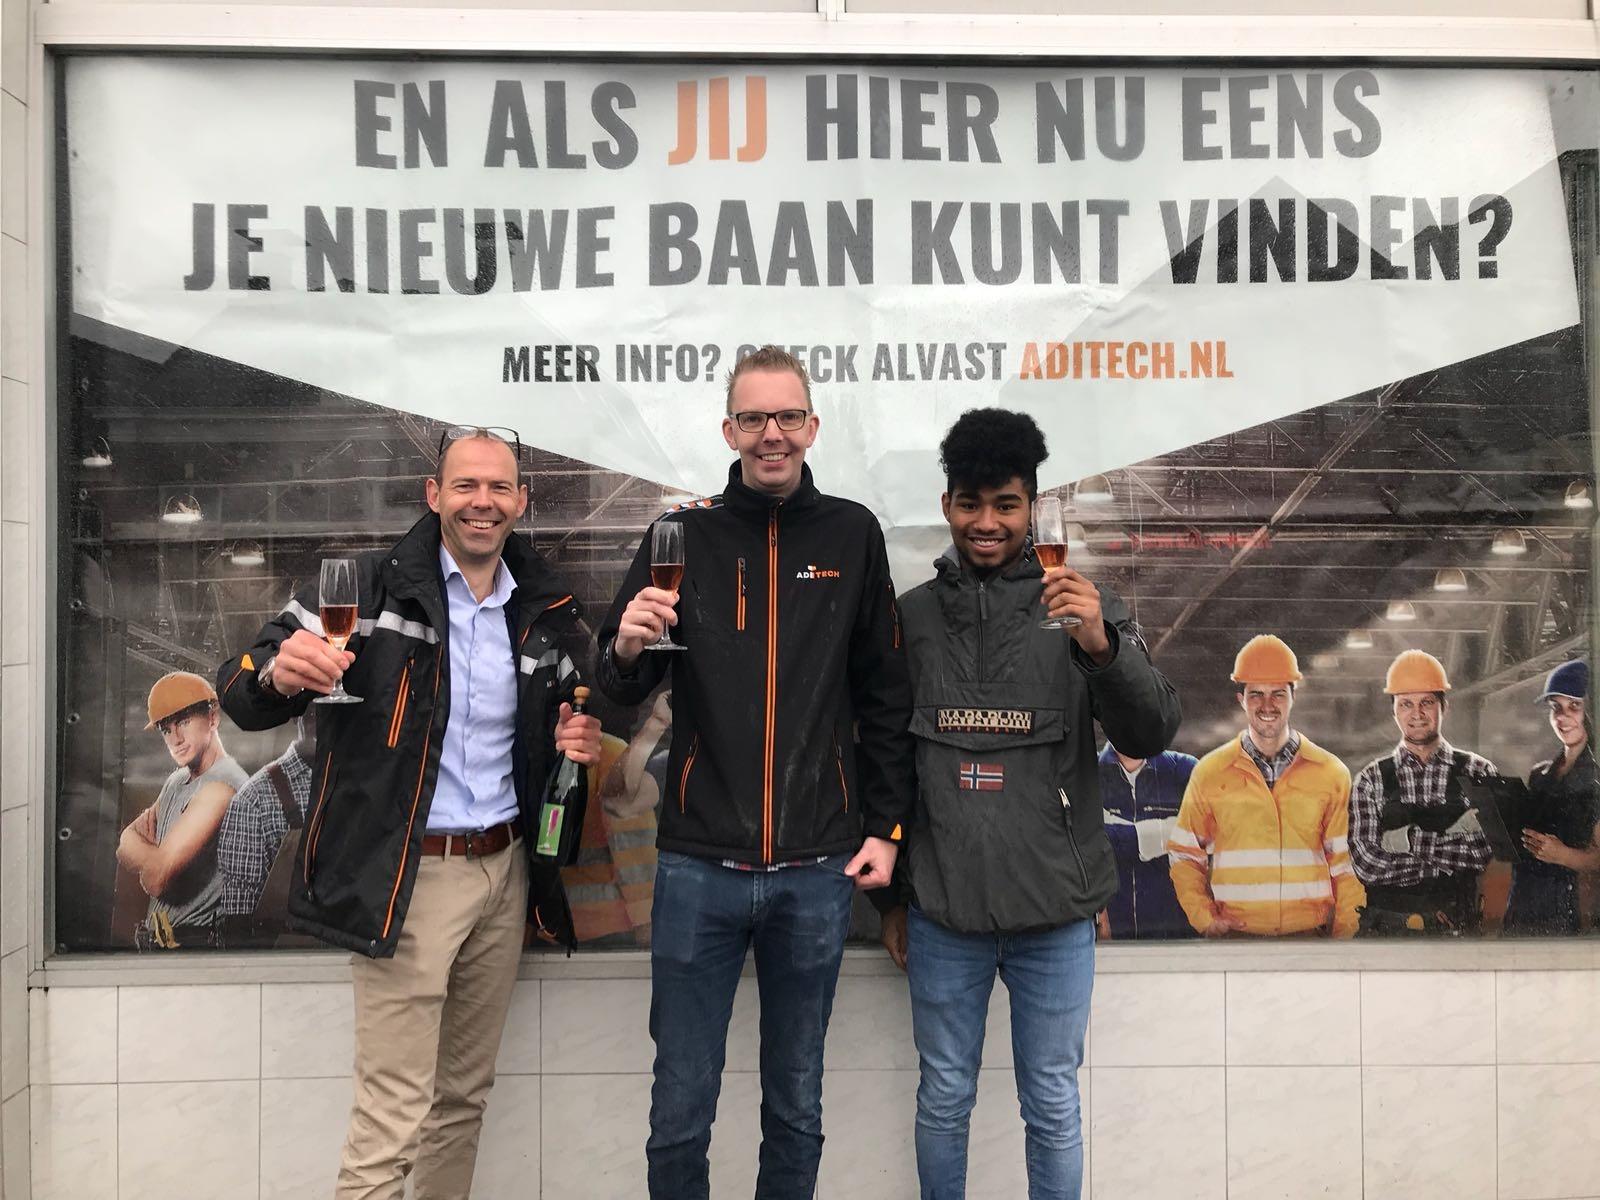 Aditech, Groningen